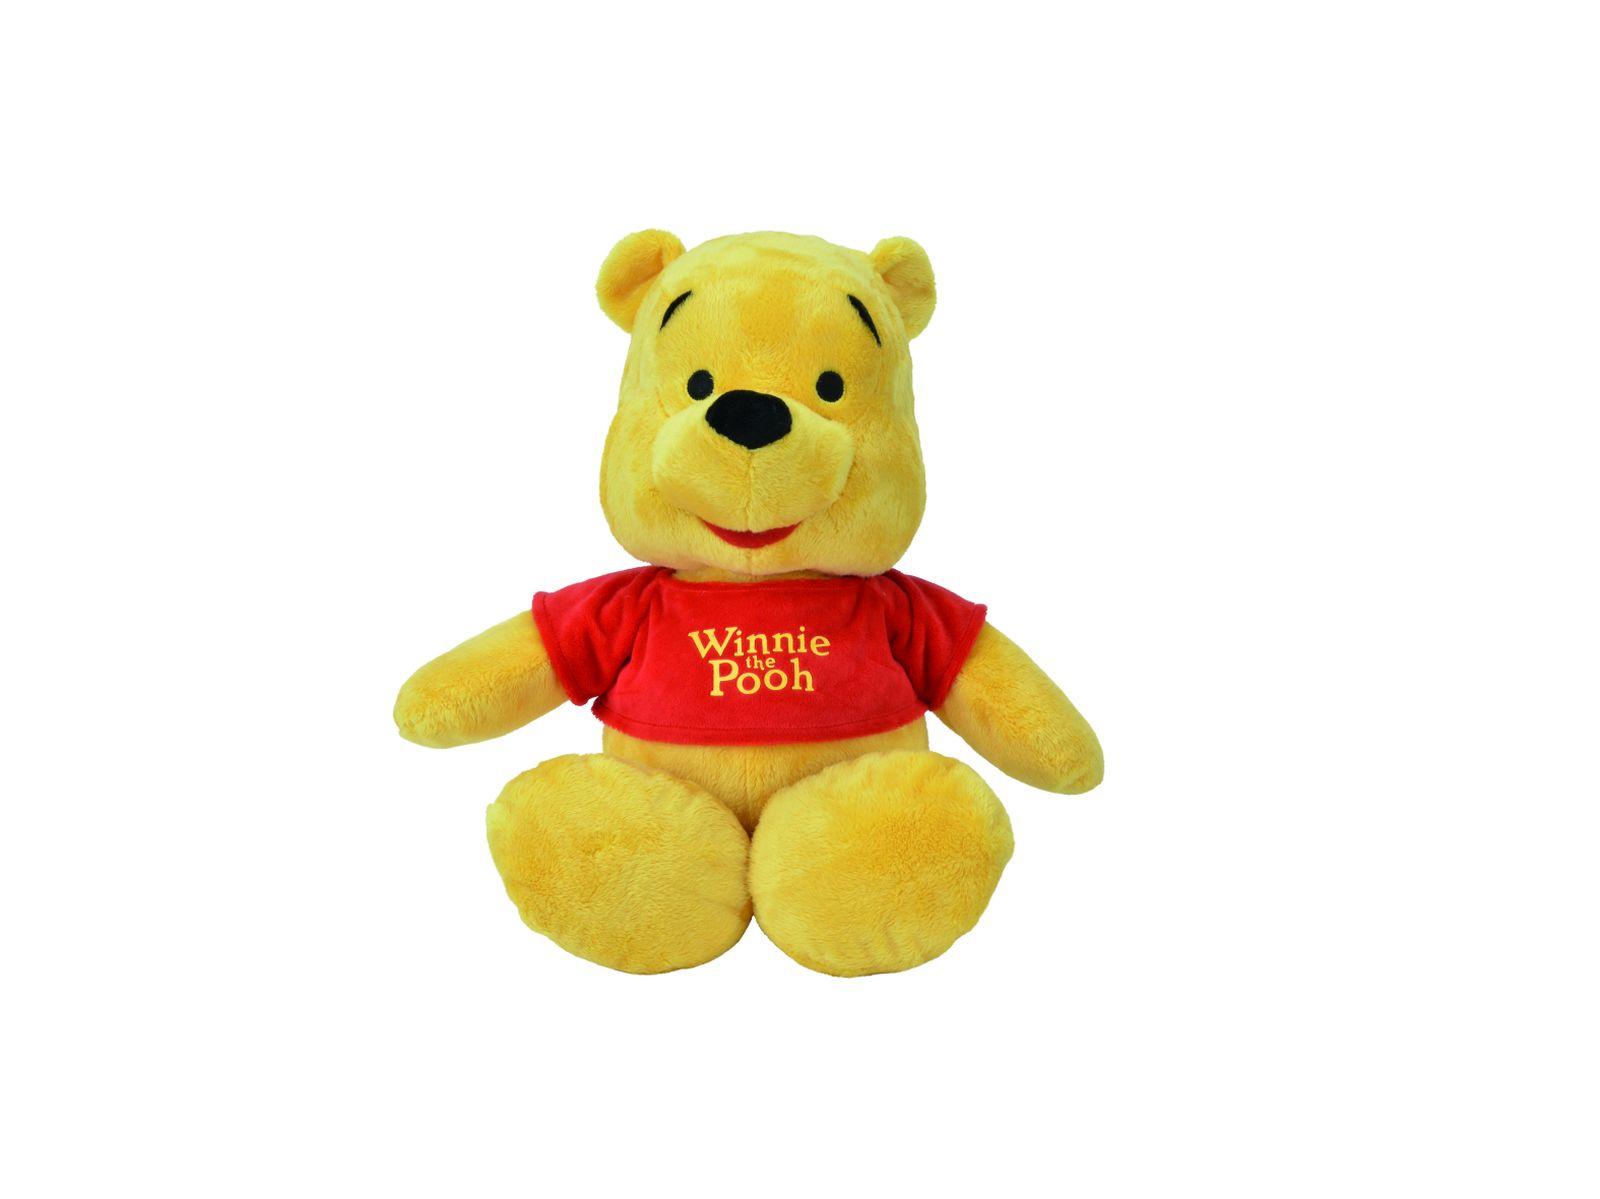 Simba disney winnie the pooh peluche 50 cm, +0 anni, 6315875043 - Disney